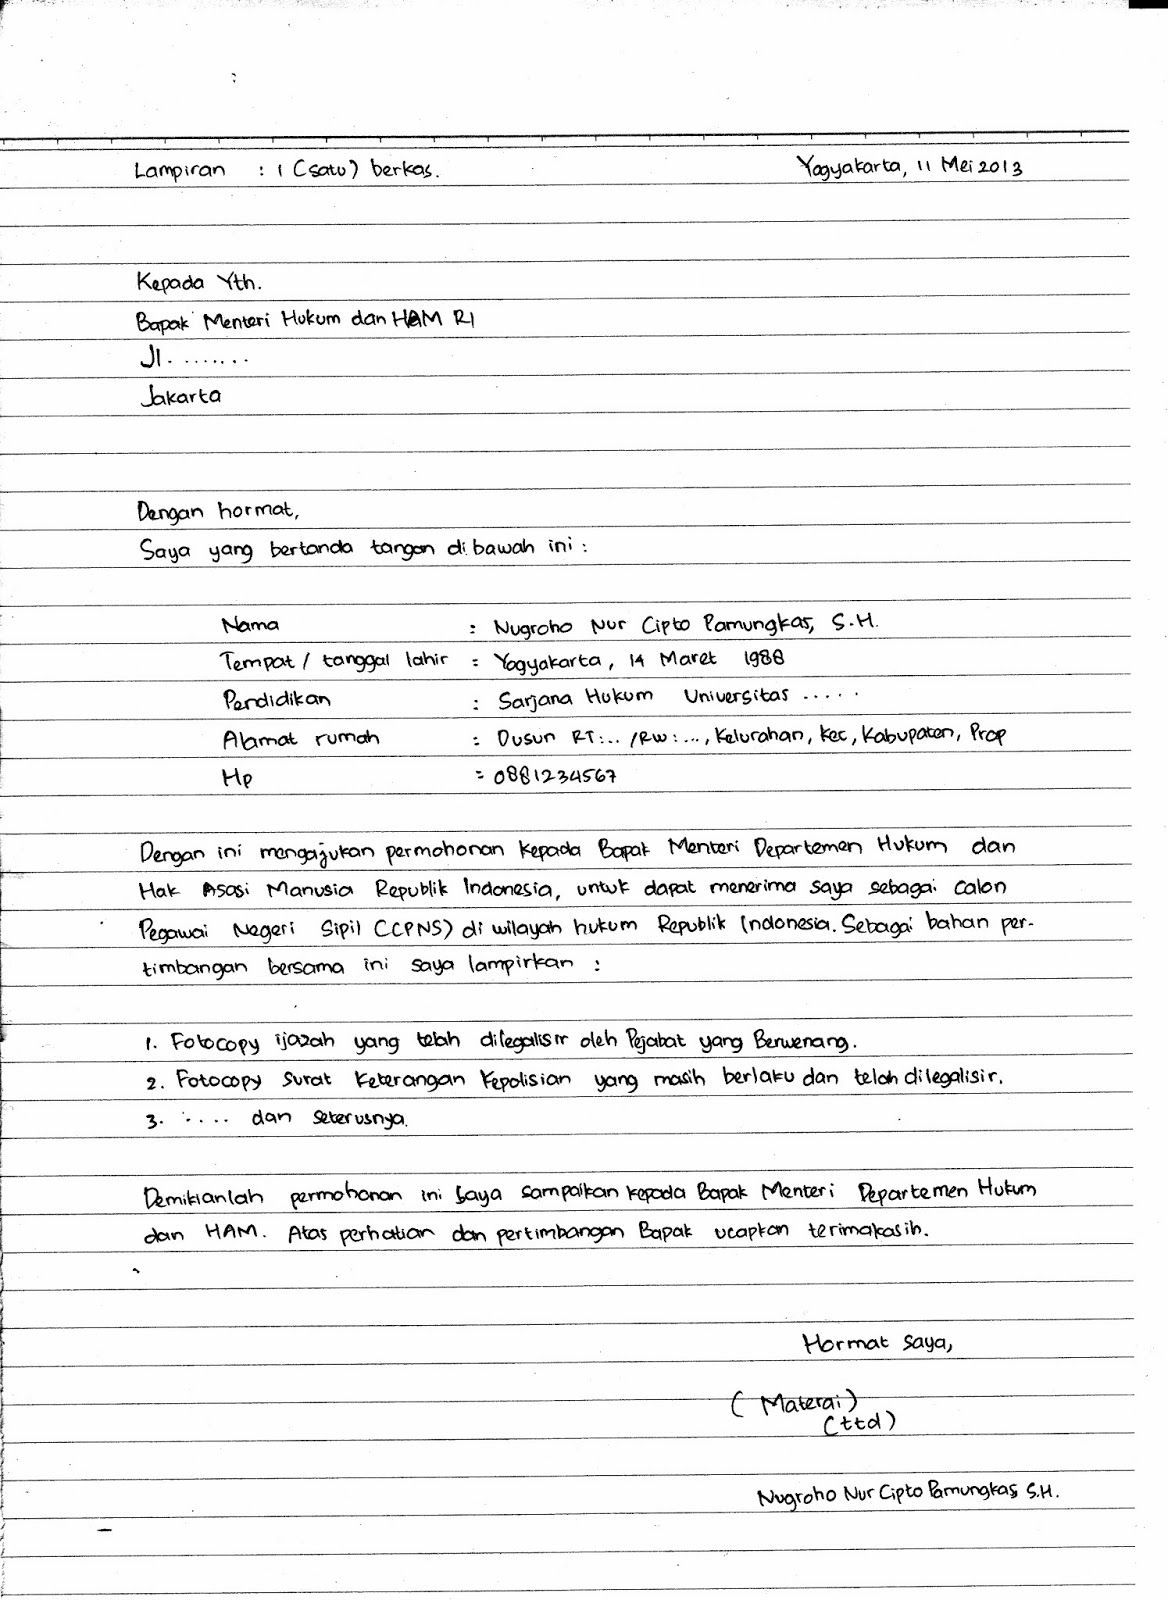 Surat Lamaran Kerja Harus Tulis Tangan Pendidikan Pinterest